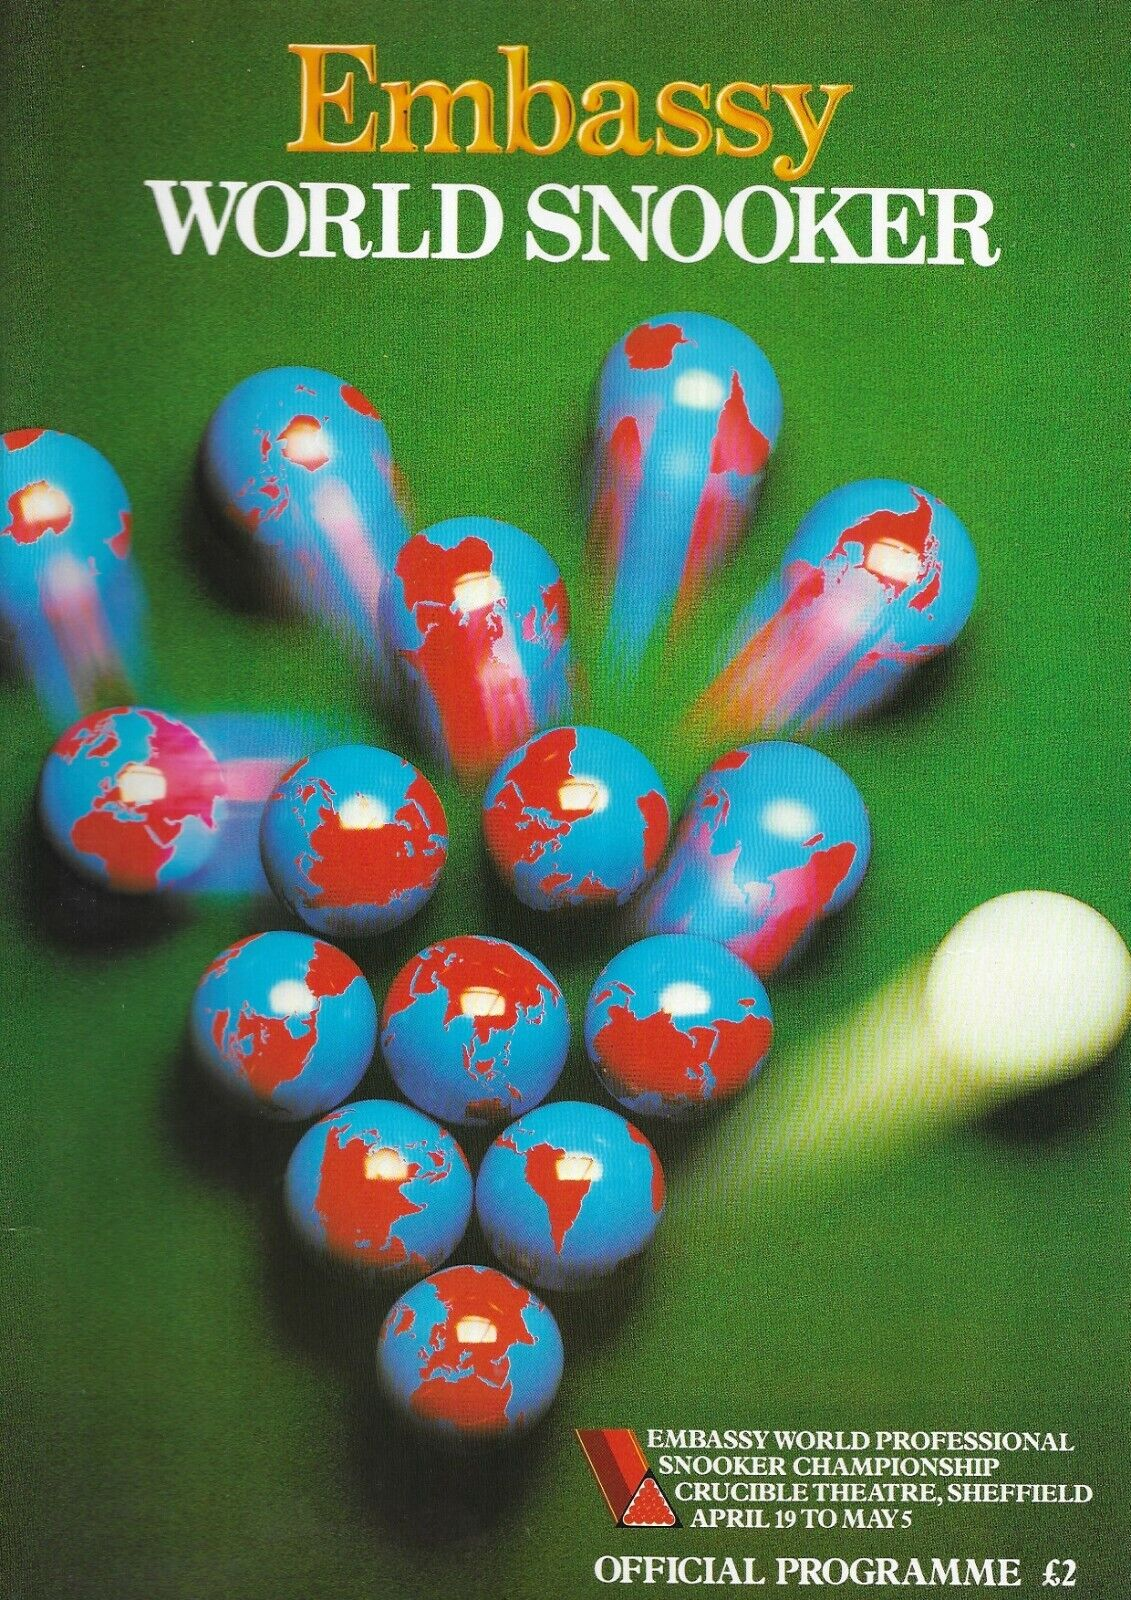 Embassy World Professional Snooker Championship 1986 Programme